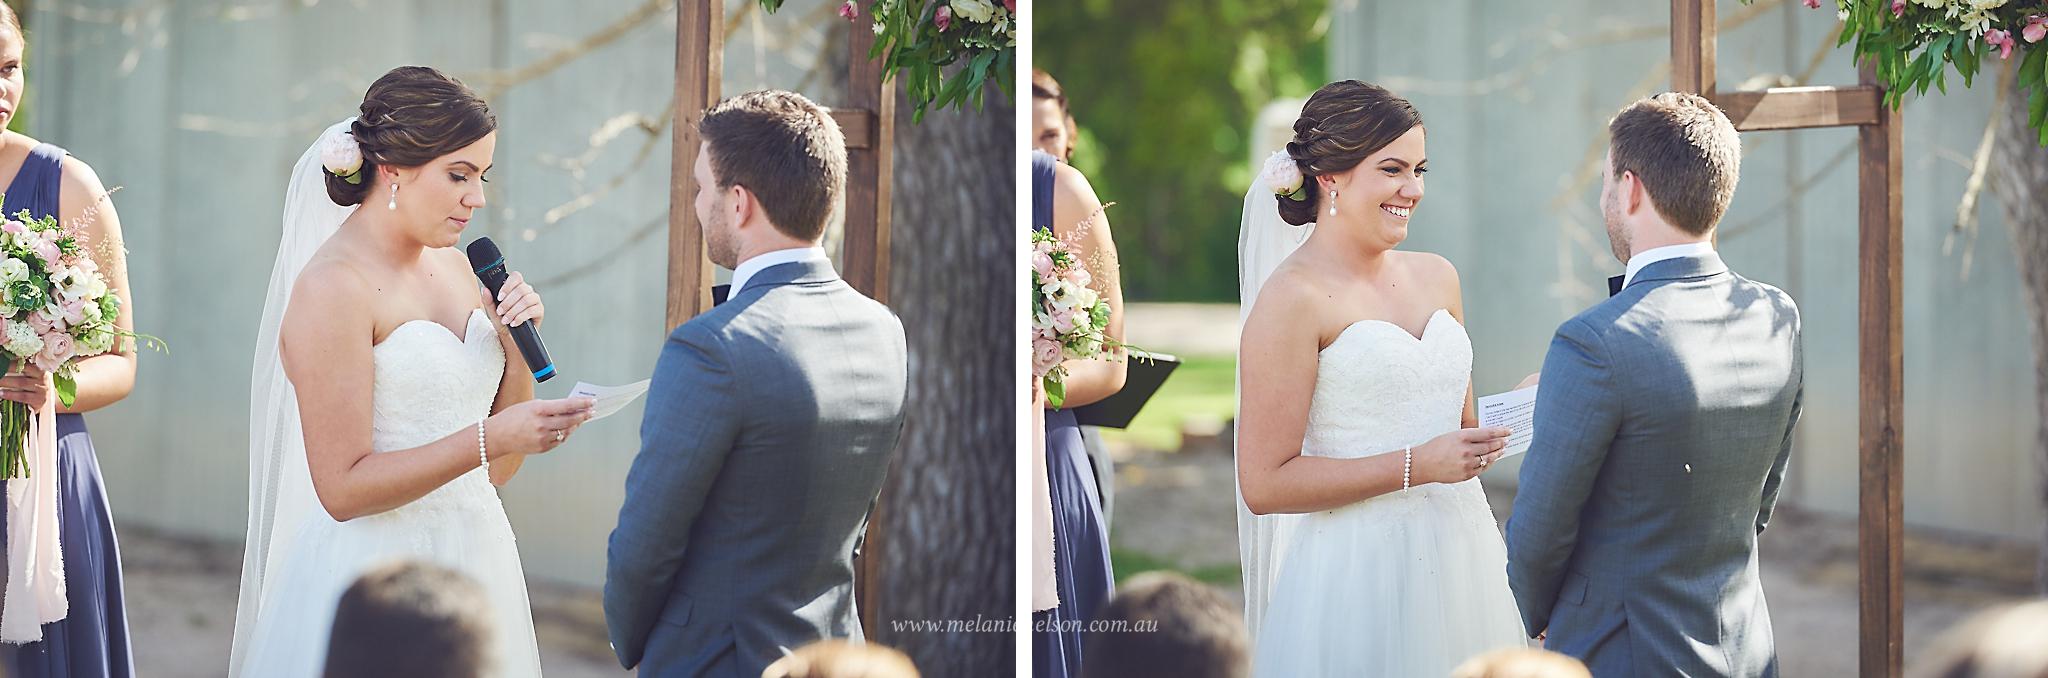 adelaide_hills_wedding_0029.jpg